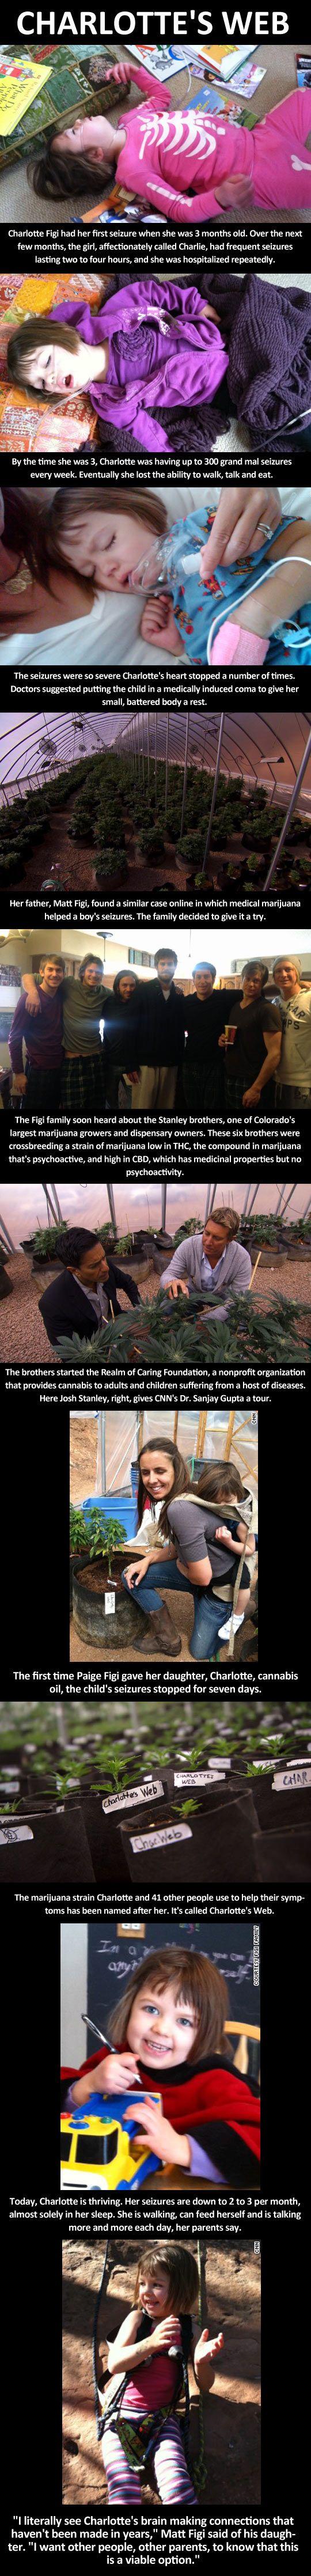 charlottes-web-medical-marijuana